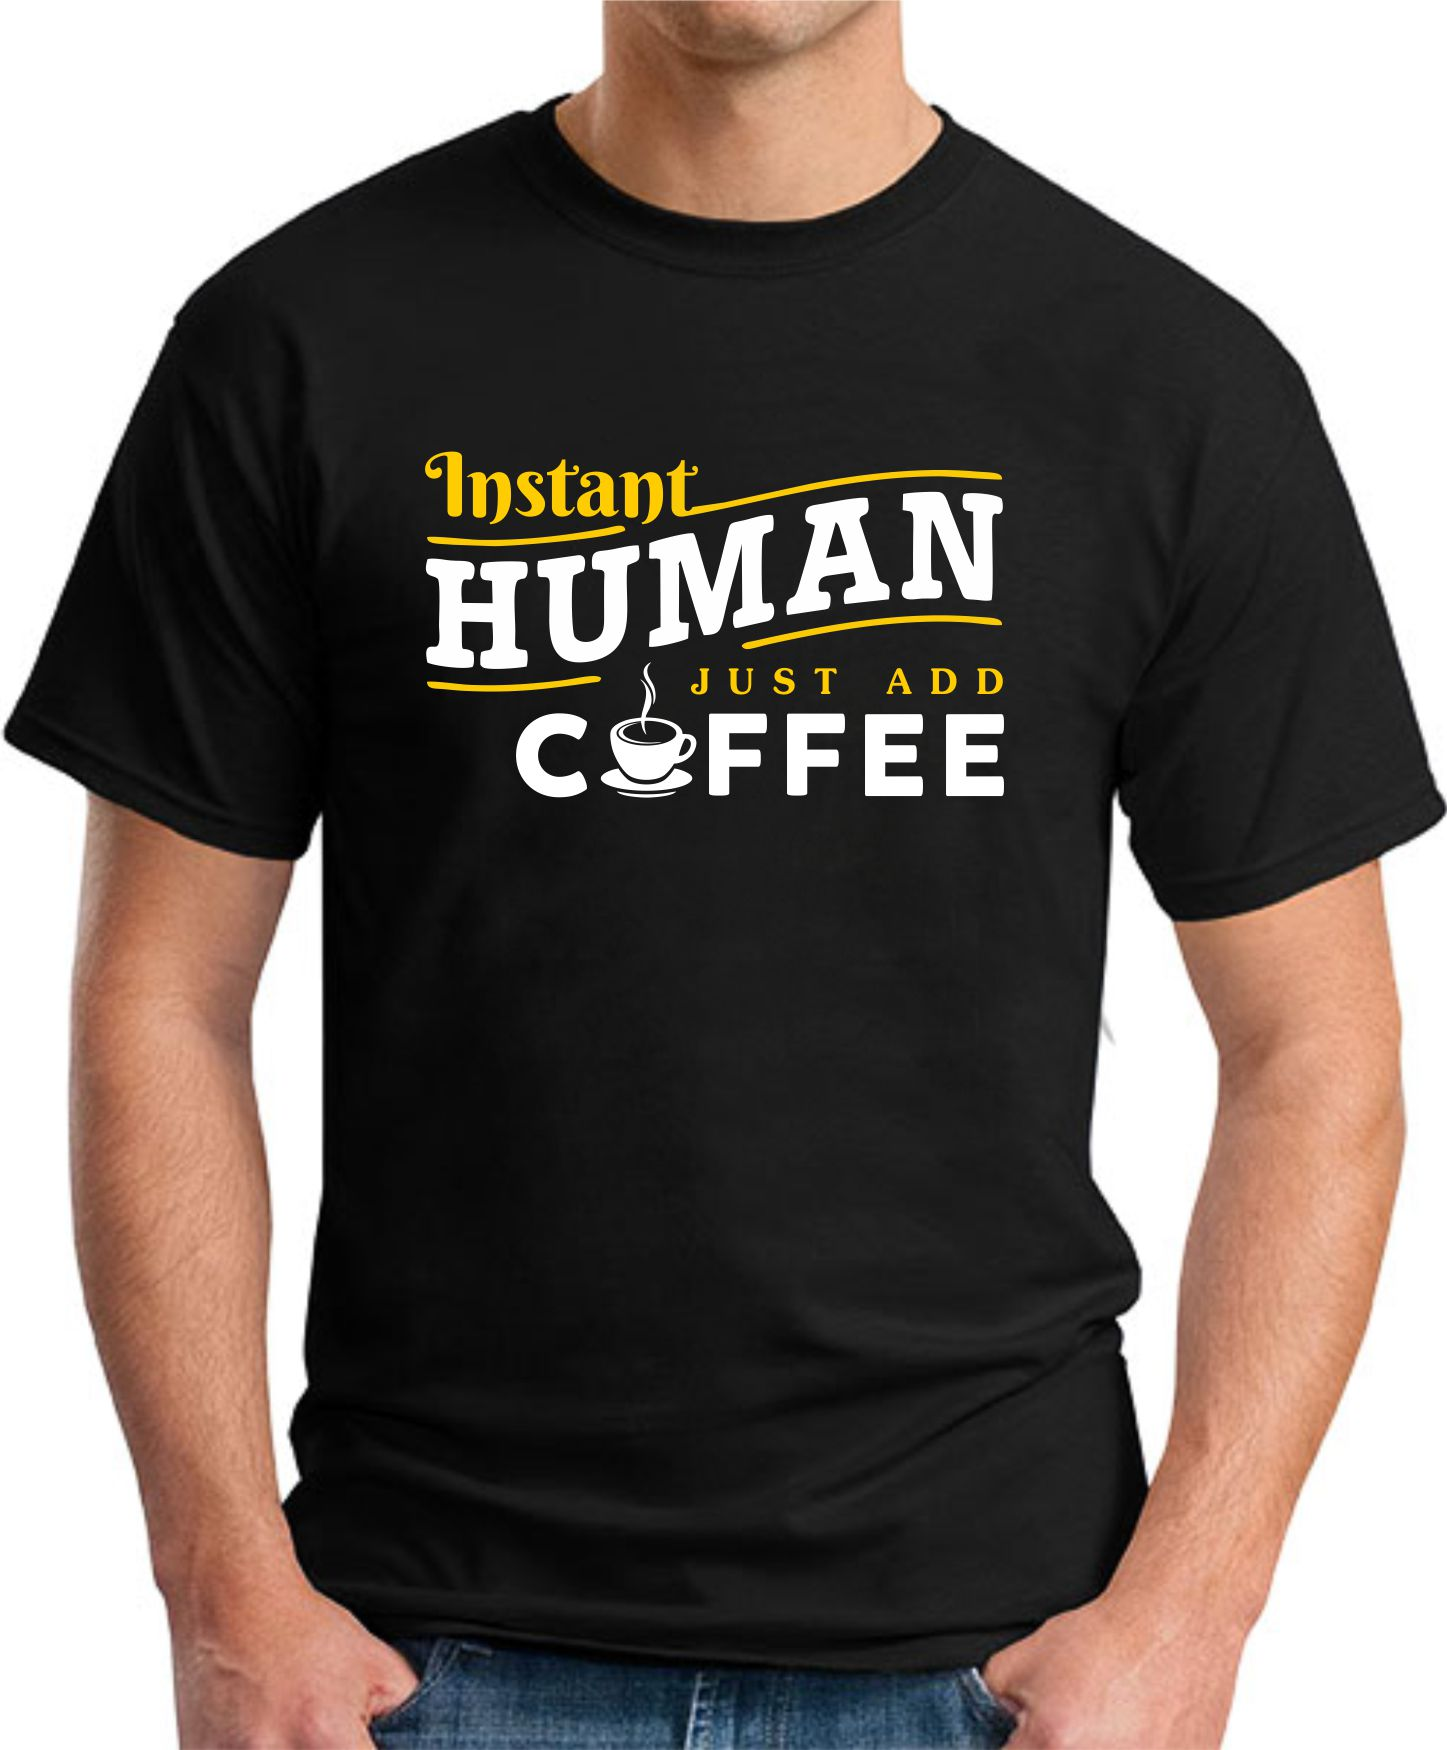 INSTANT HUMAN JUST ADD COFFEE dark heather